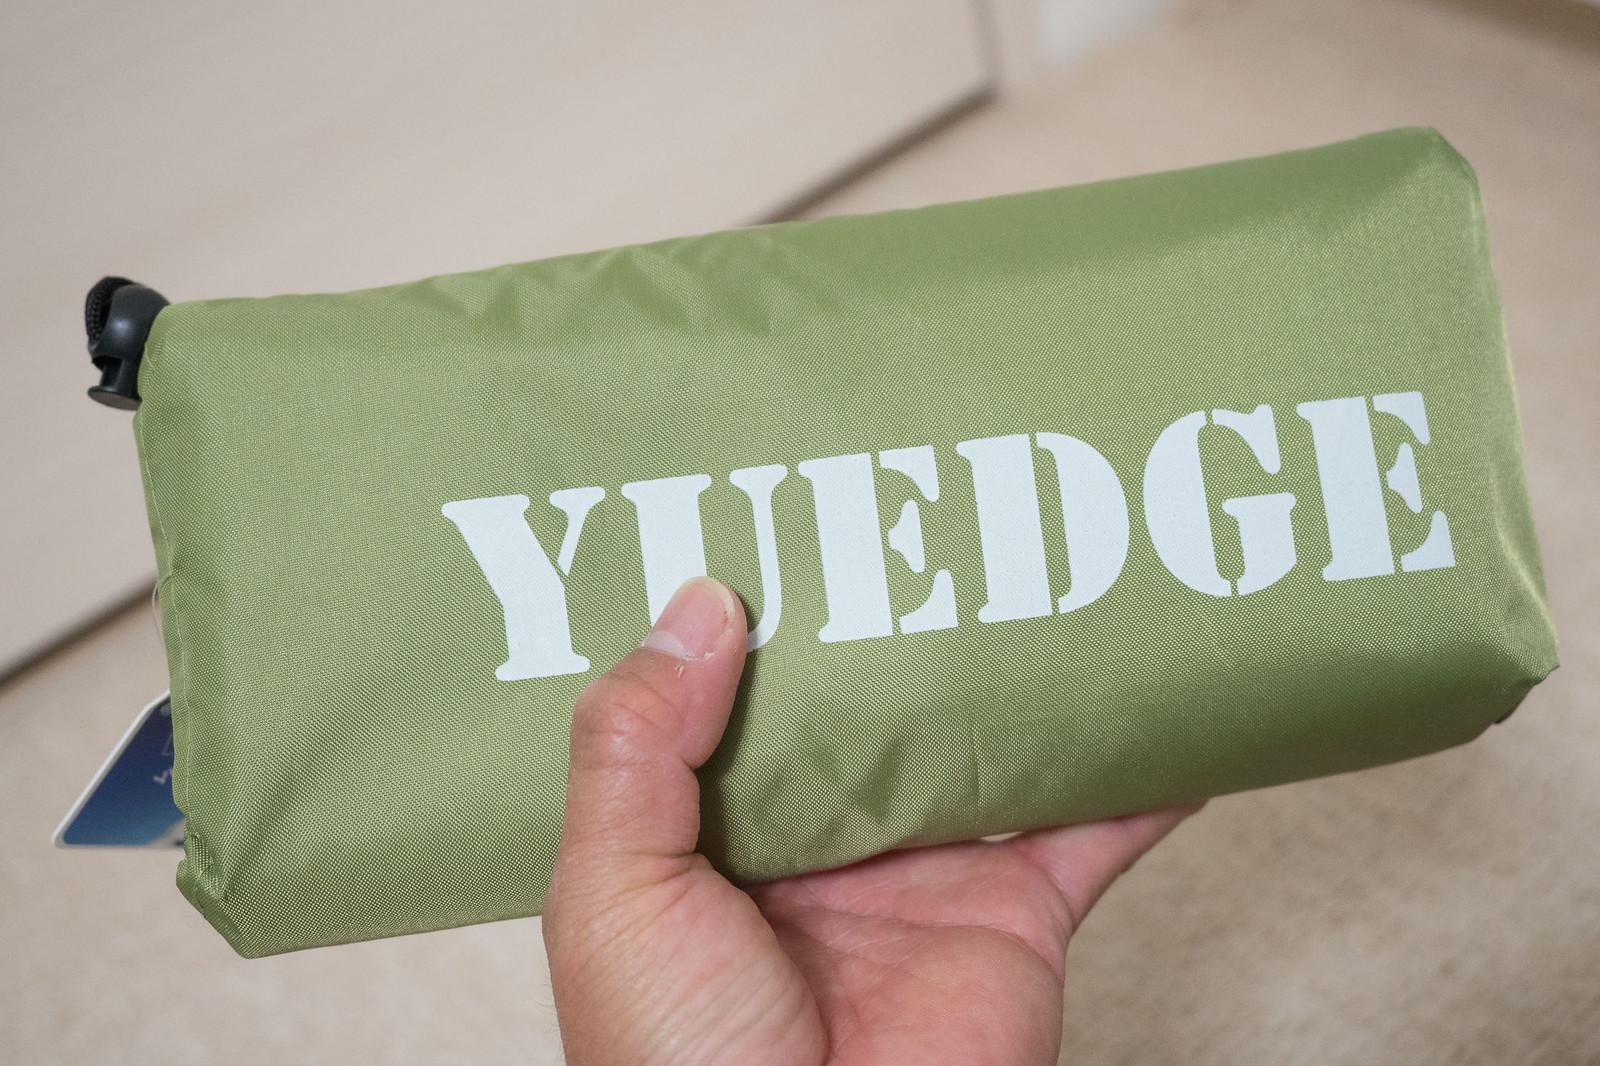 YUEDGE-4